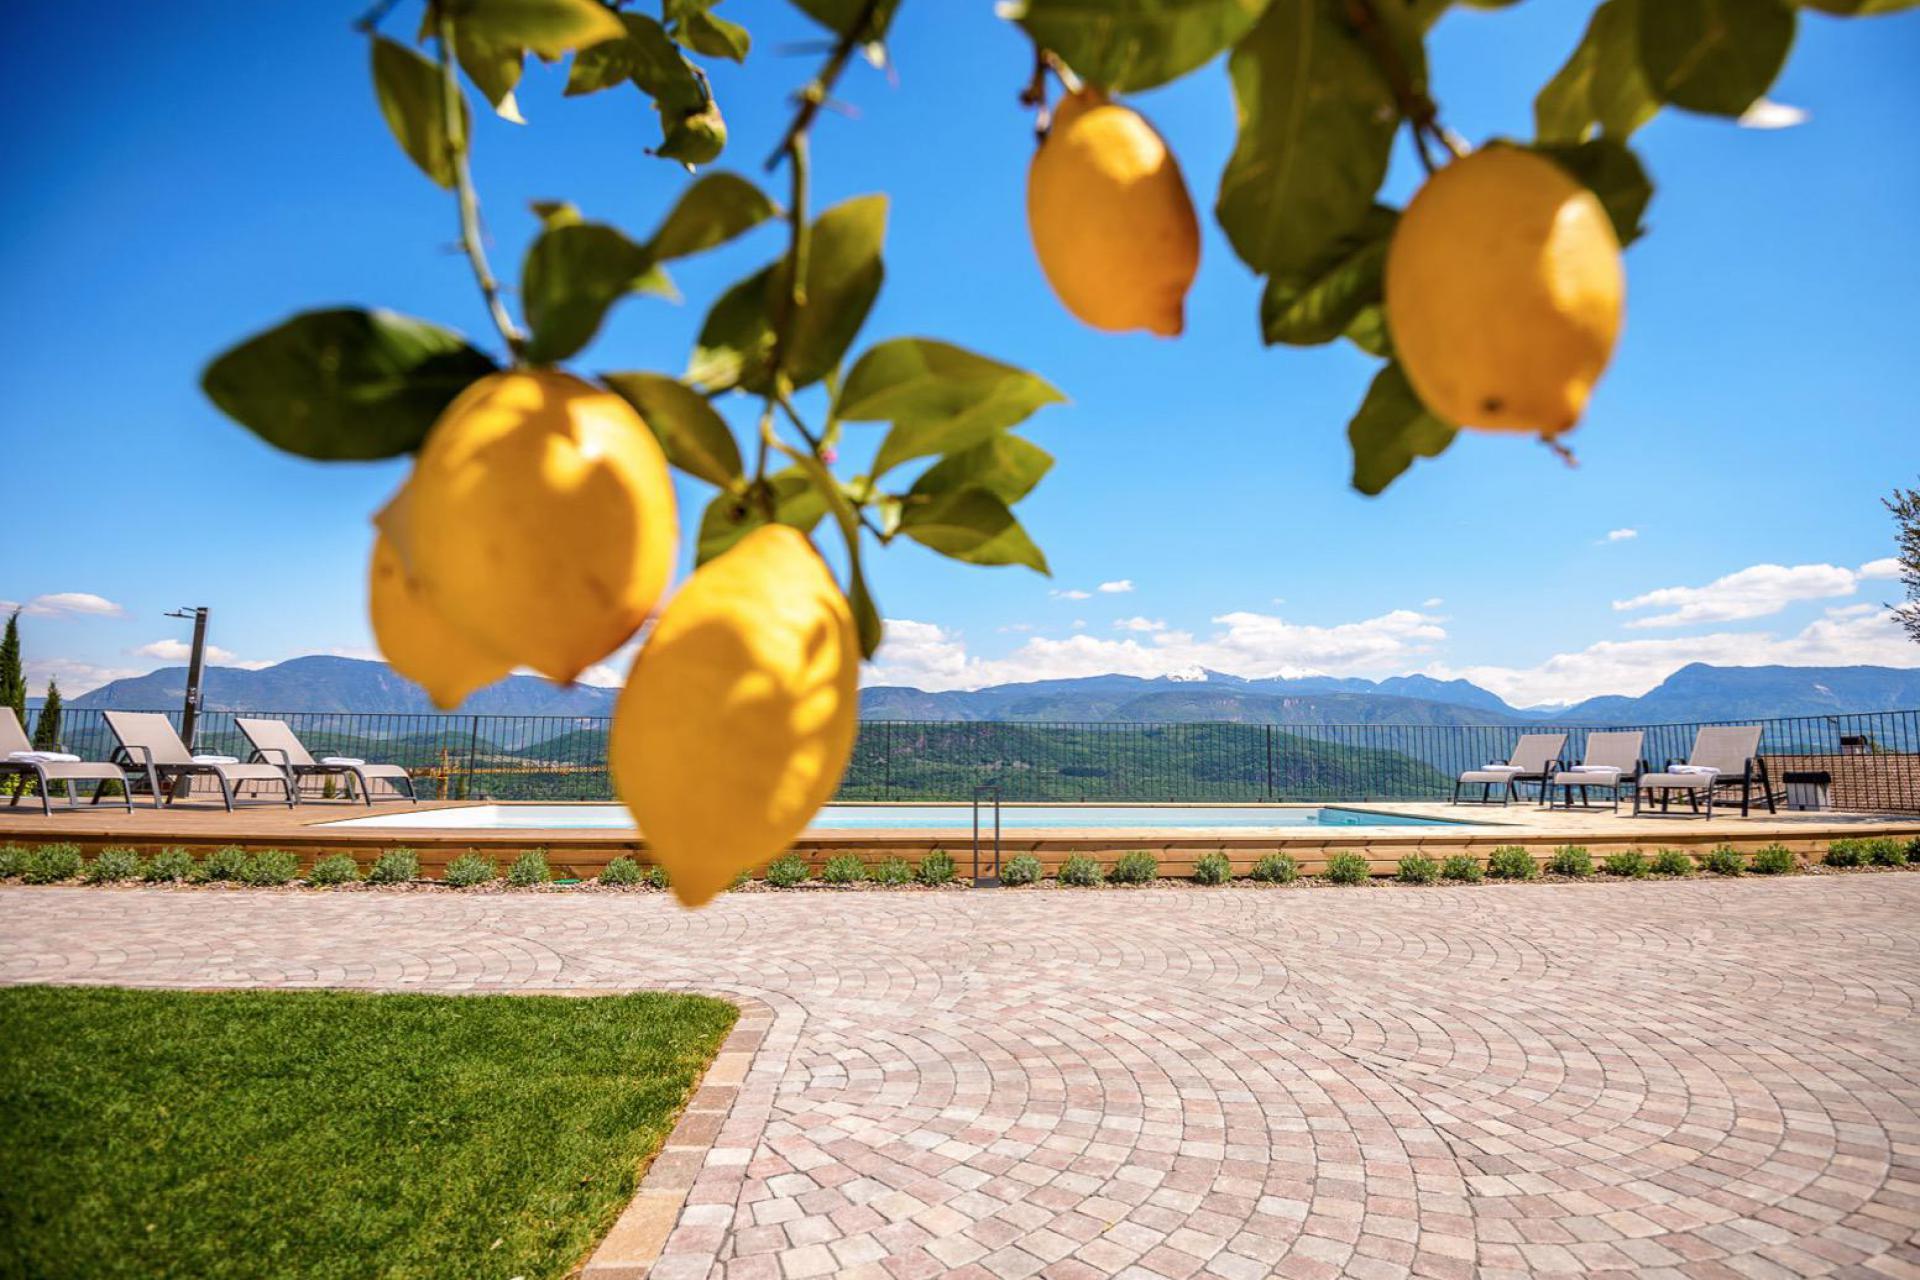 Agriturismo Dolomiti Accogliente agriturismo tra meli e vigneti